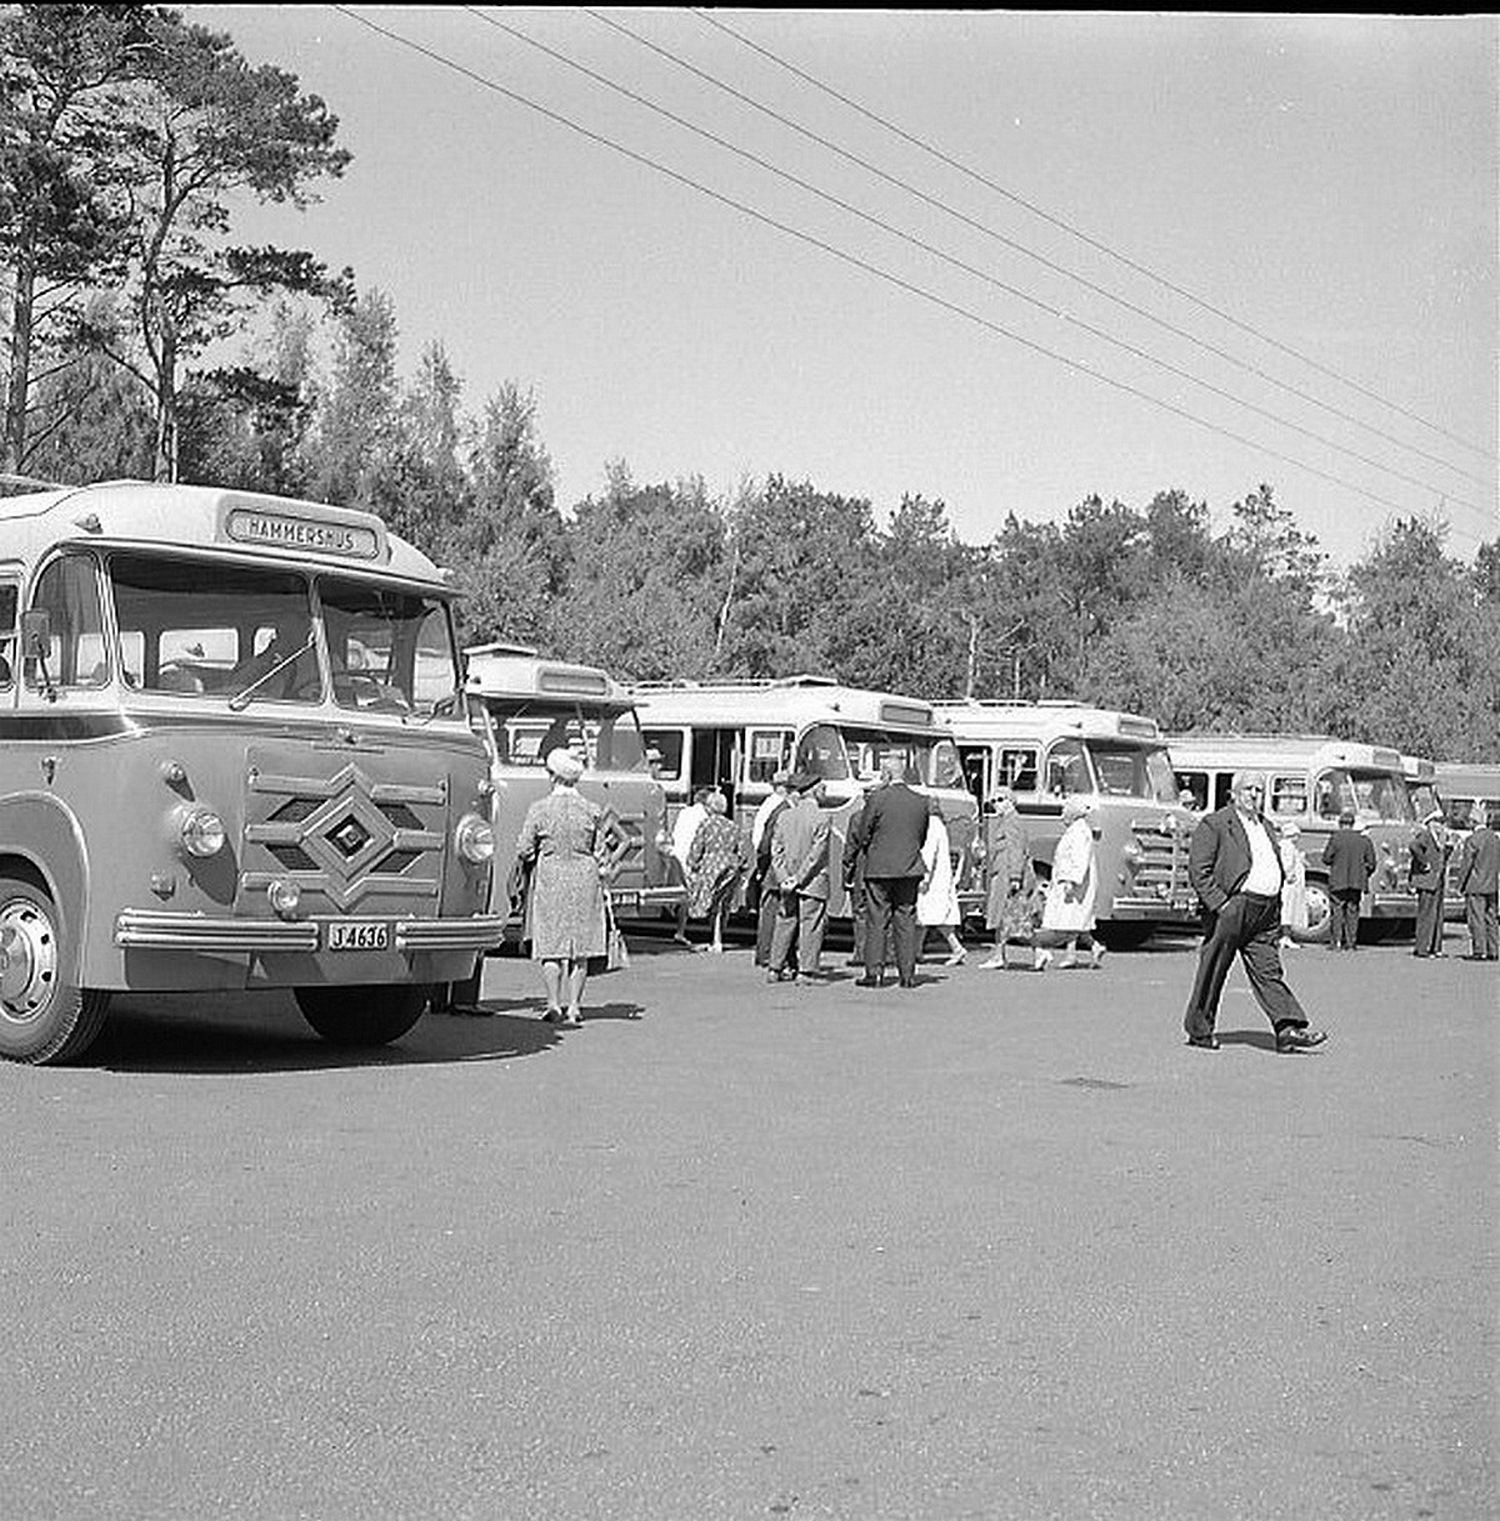 E2 DBJ Busser 13x18 n nr 9073c